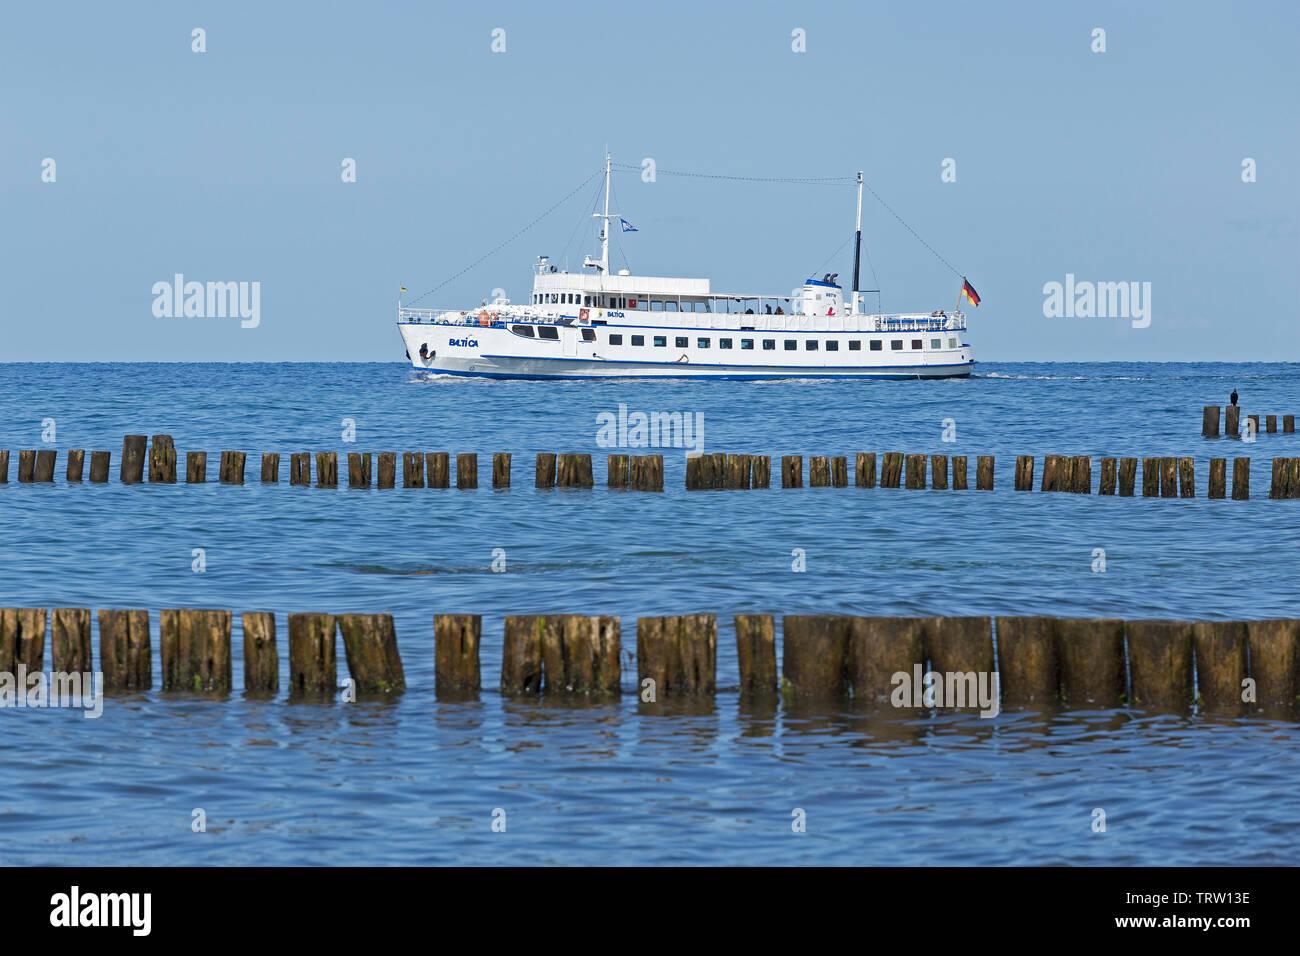 passenger ship leaving Kuehlungsborn, Mecklenburg-West Pomerania, Germany - Stock Image